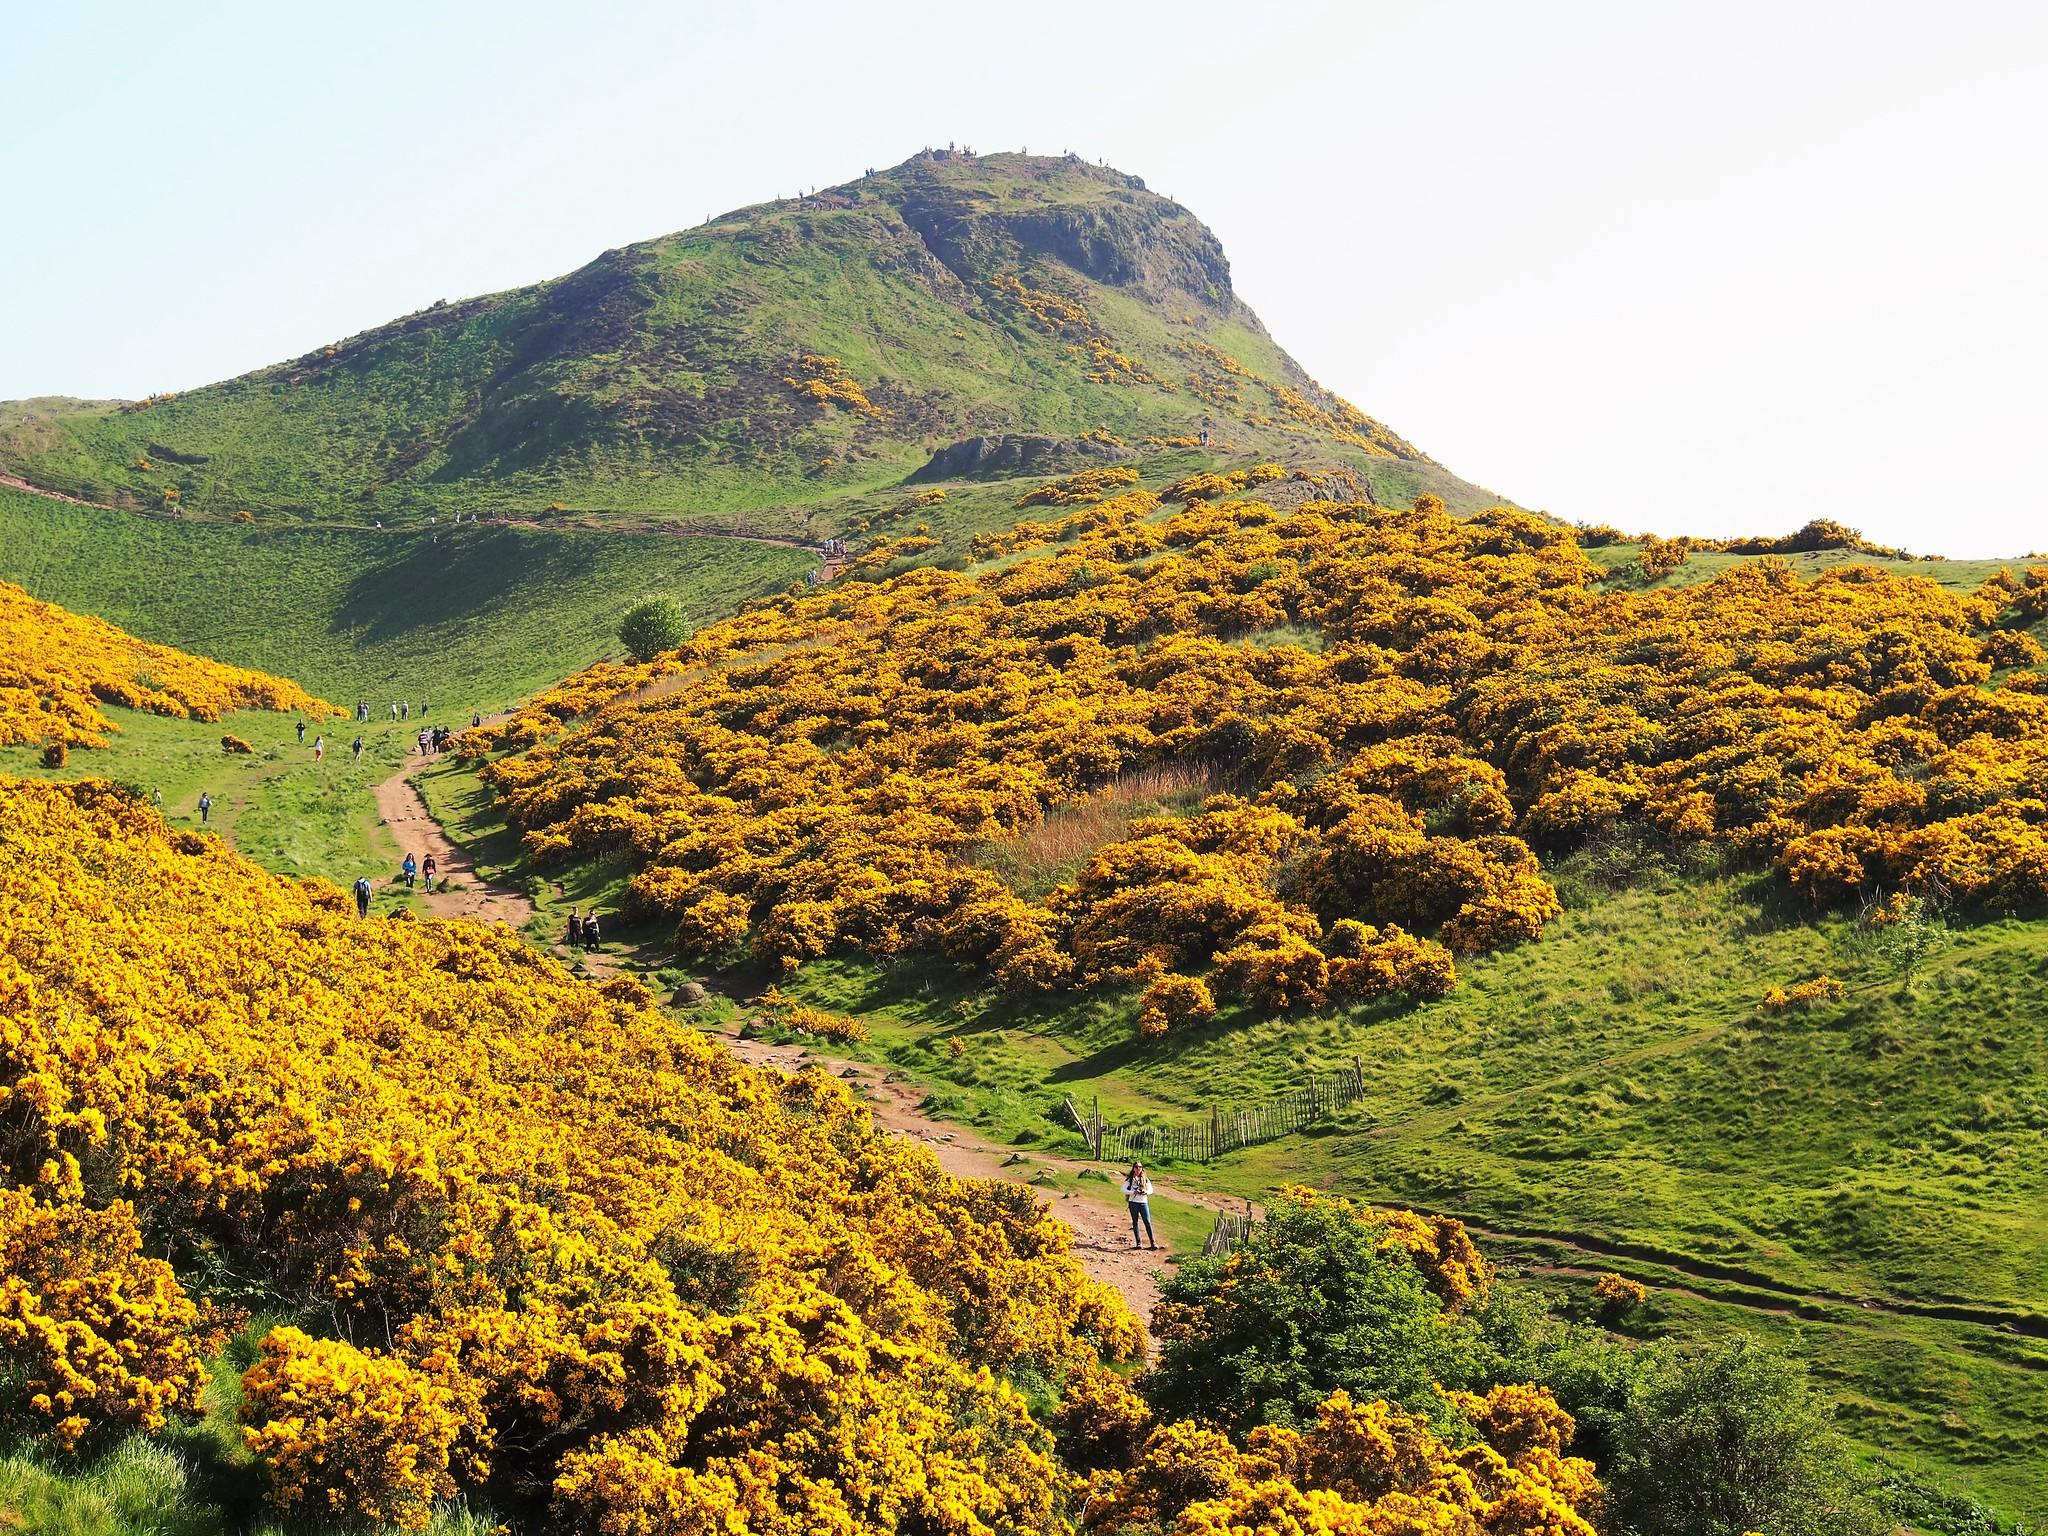 Trail to Arthur's Seat, Holyrood Park, Edinburgh, Scotland.